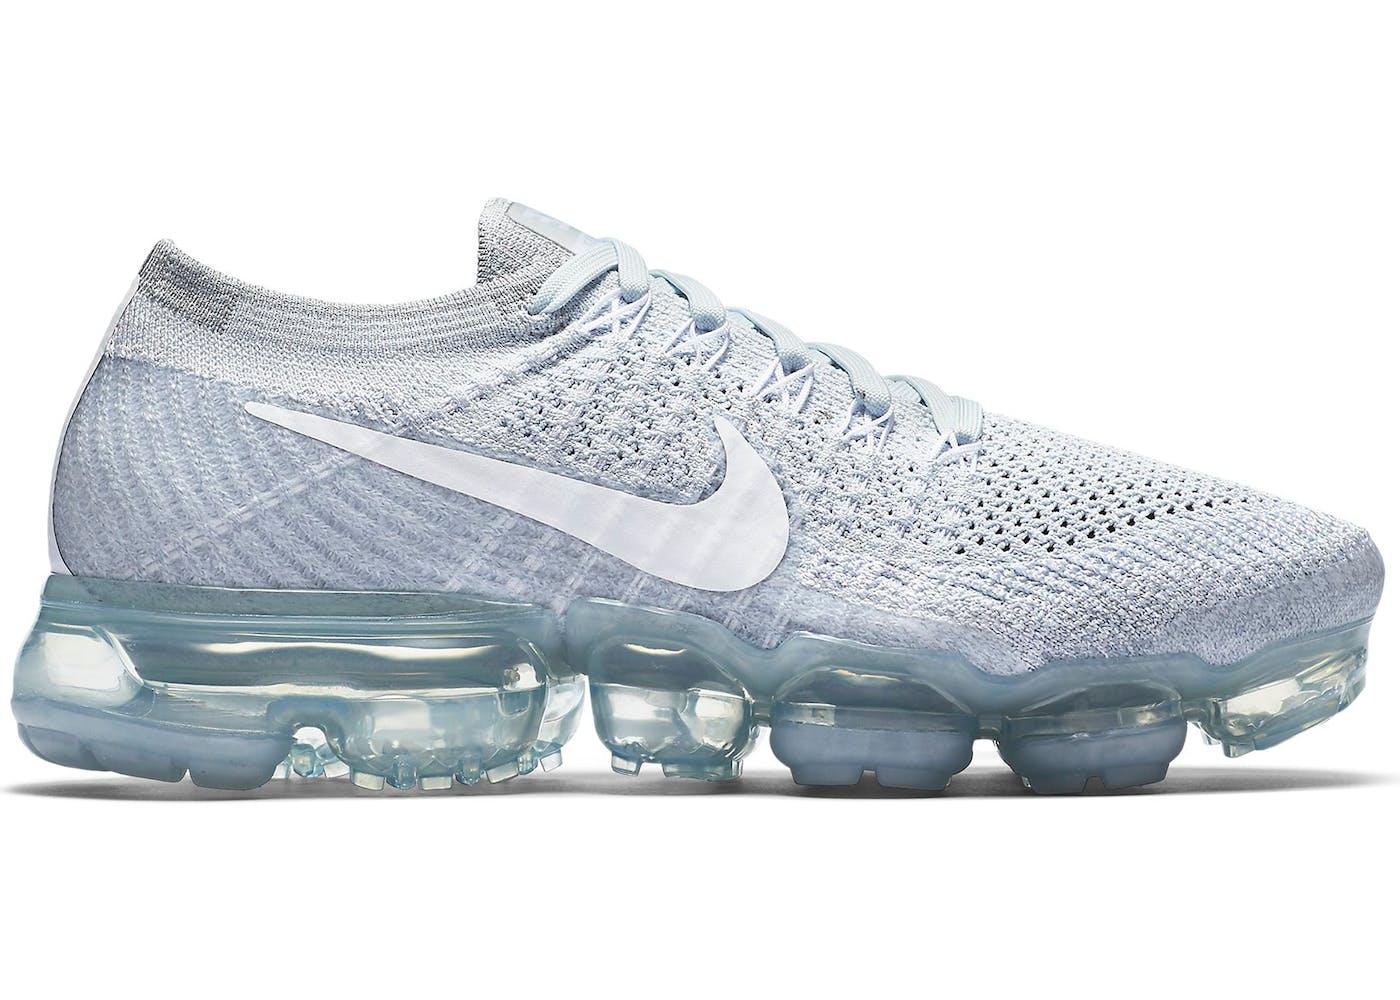 Nike Air Vapormax Pure Platinum